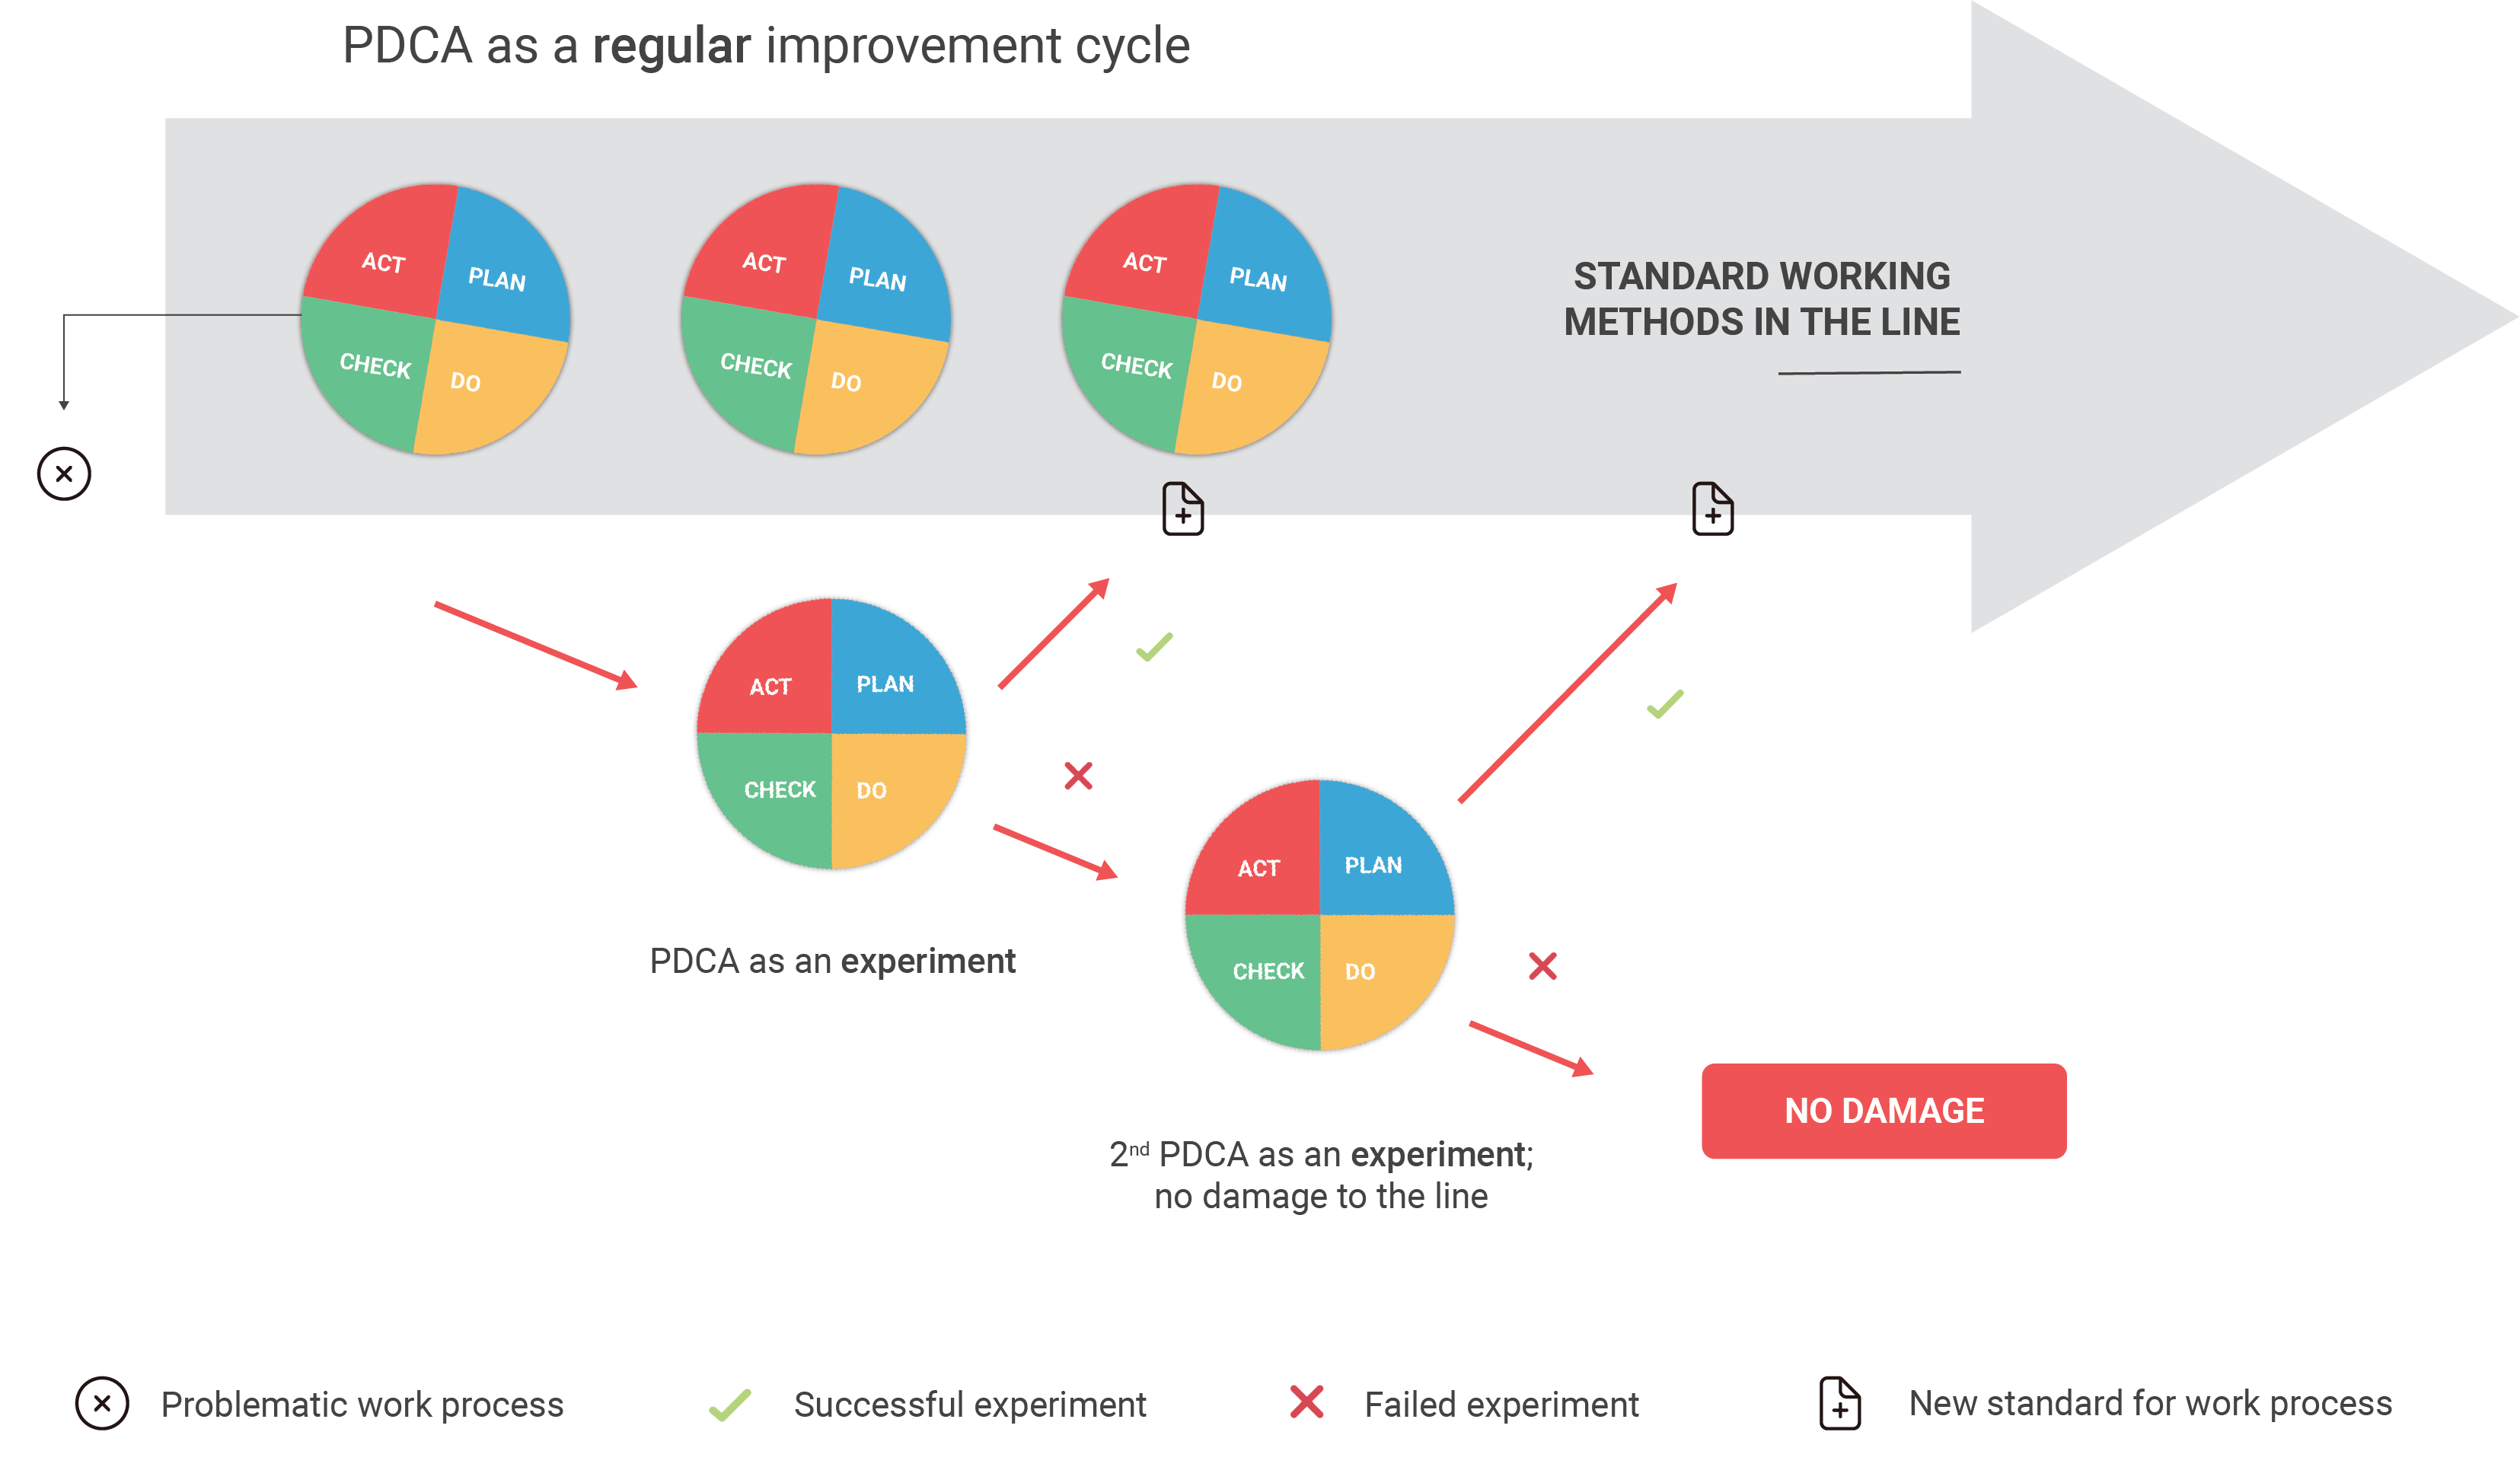 PDCA improvement cycles